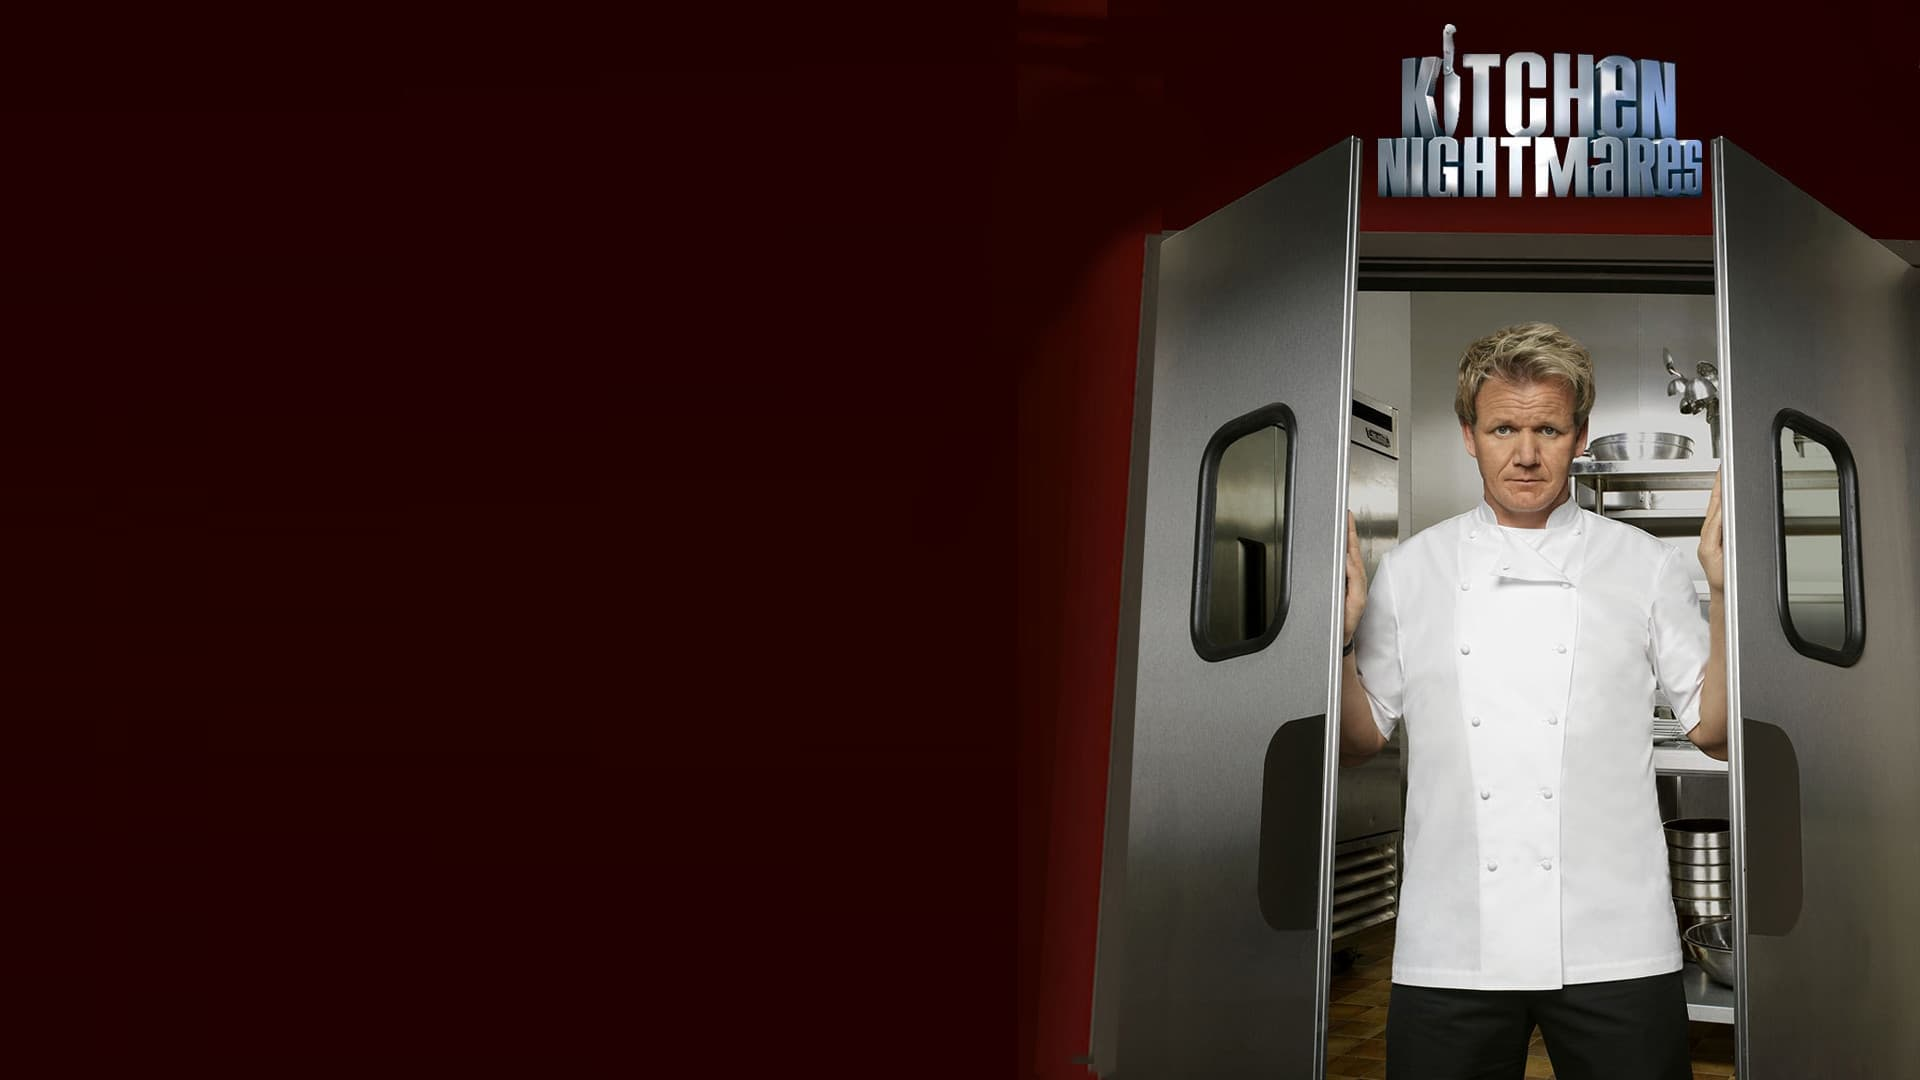 Ramsay 39 S Kitchen Nightmares 2004 Movie Media Pictures